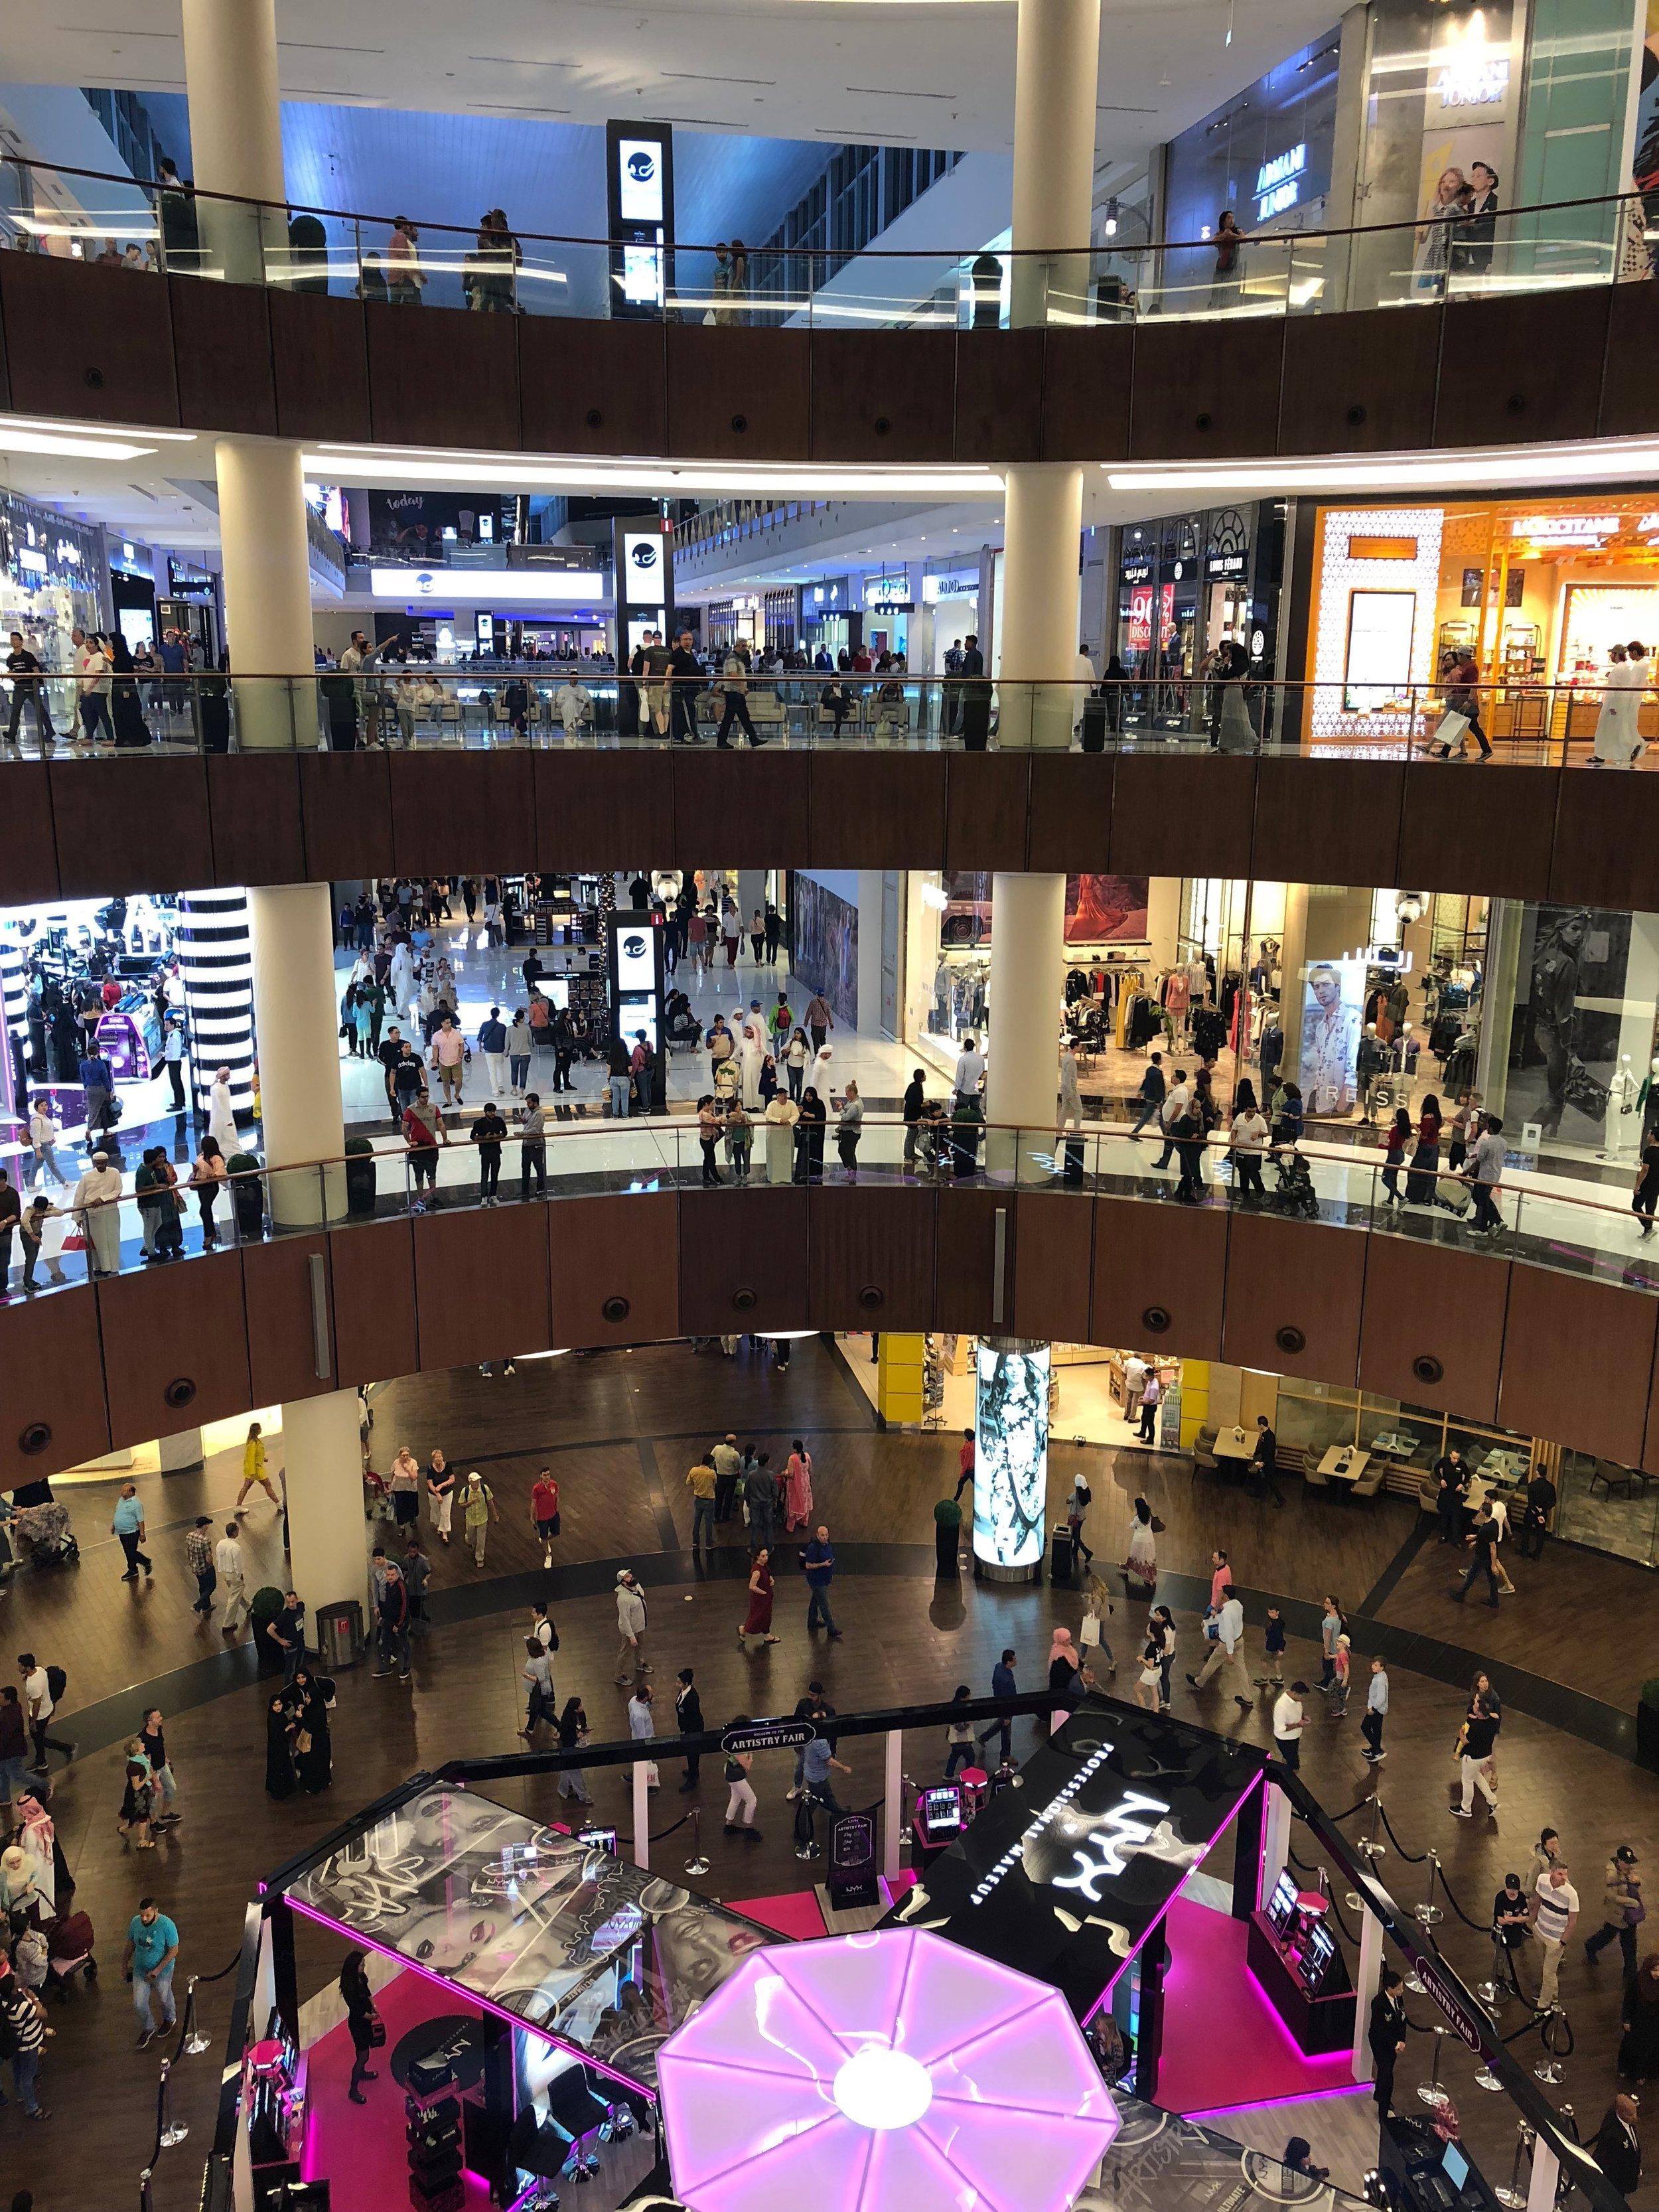 Dubai Mall.....50 football fields in size